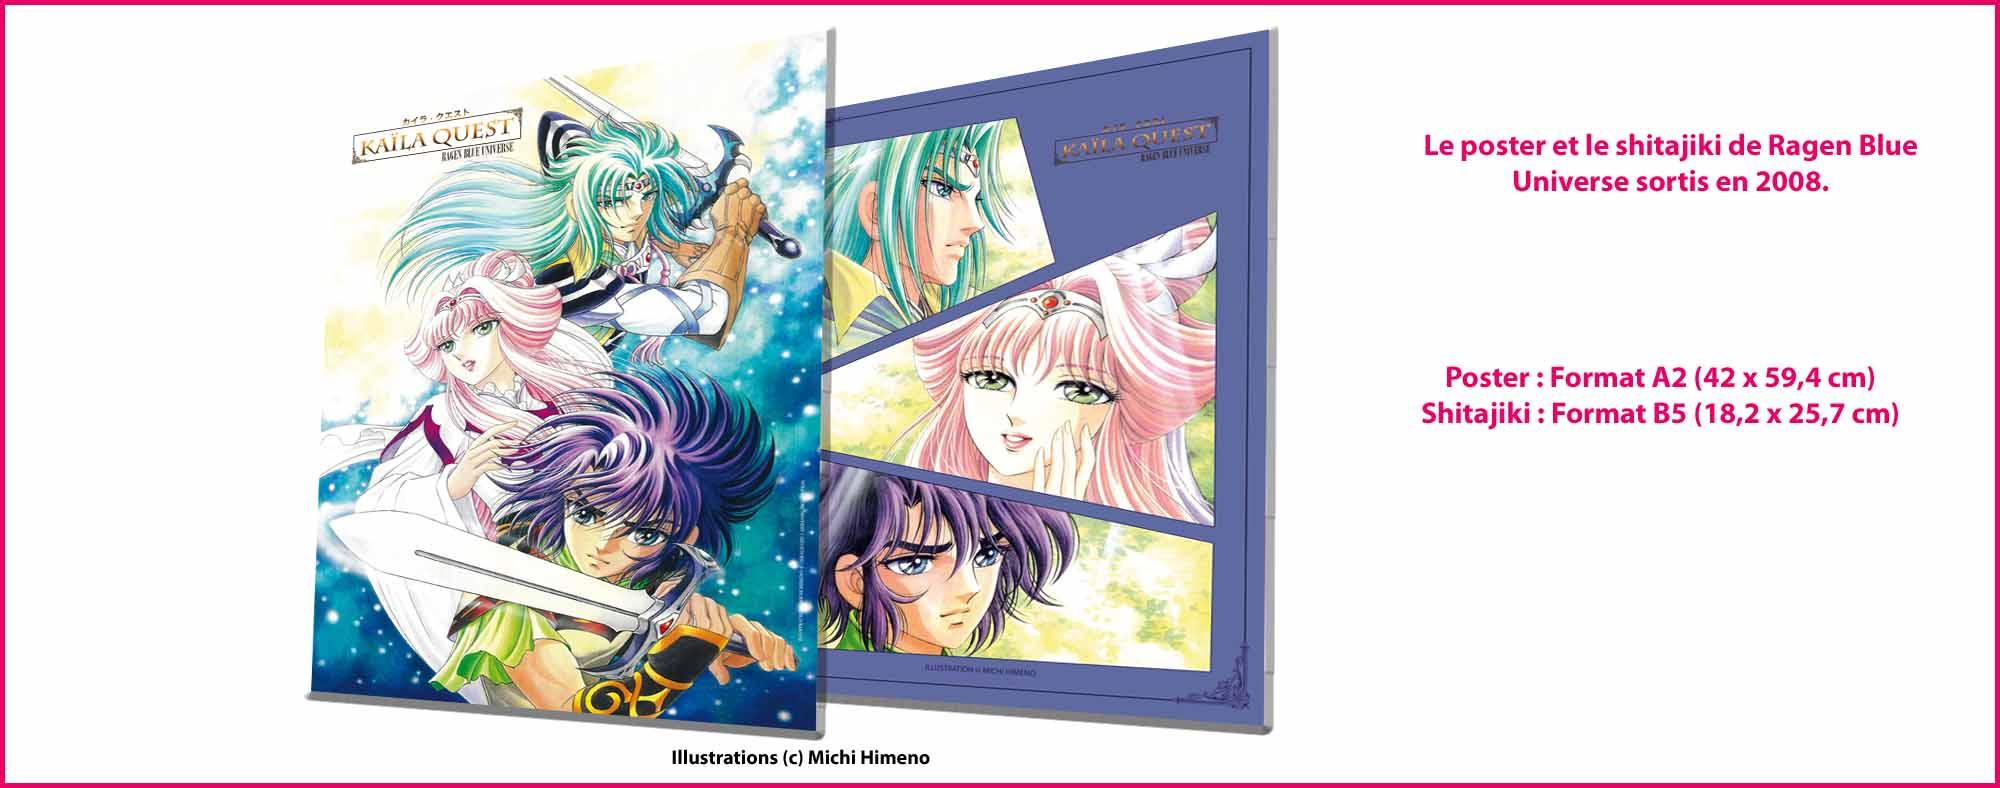 De nouvelles illustrations et goodies de Michi Himeno (Saint Seiya, Lady Oscar, Yugioh...) RAGENBLUEUNIVERSE2008_poster_et_shijiki